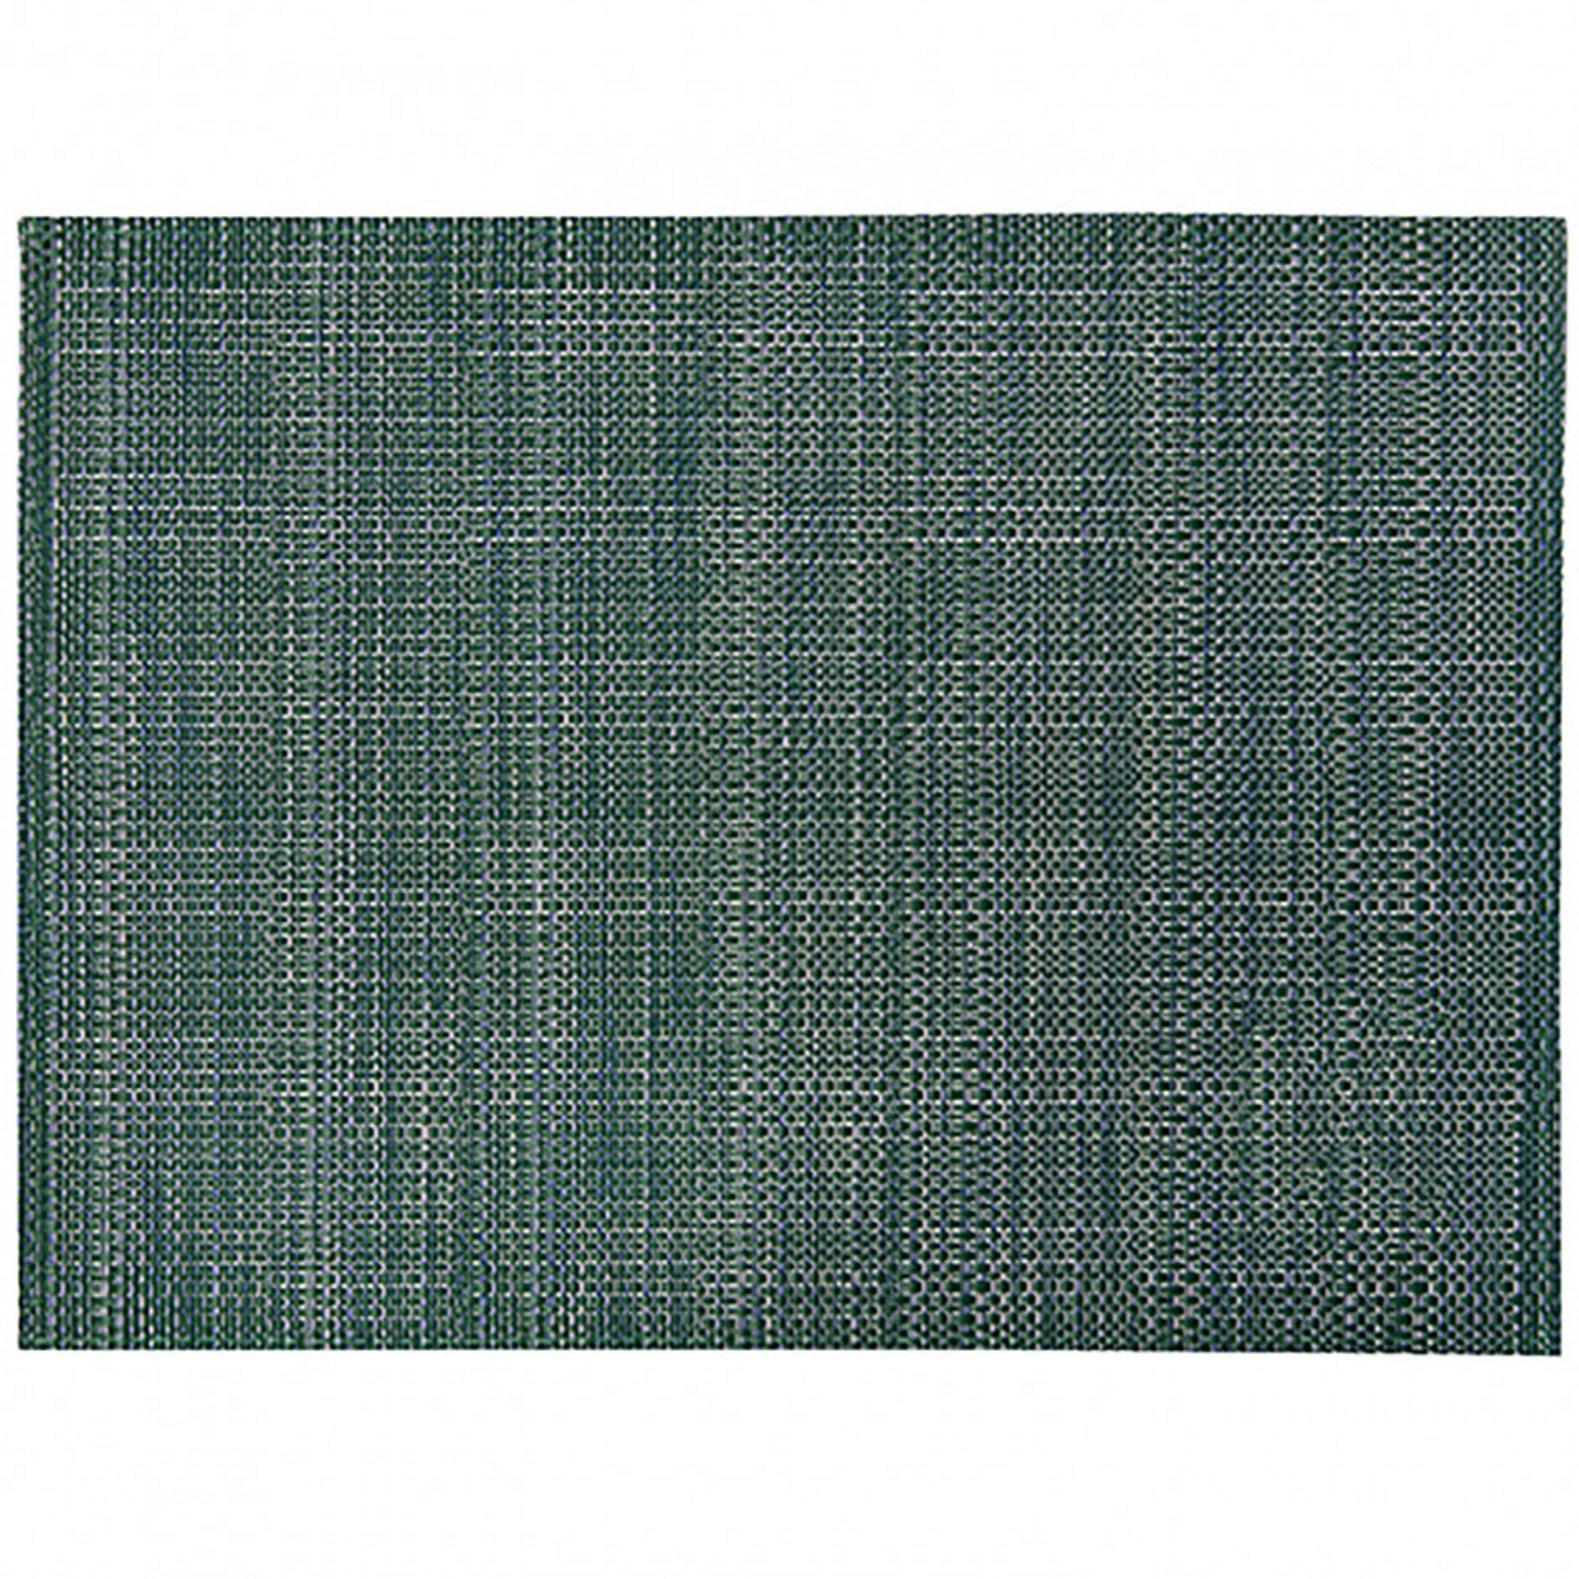 Онлайн каталог PROMENU: Подставка под тарелку Winkler CANNA, 33х45 см, зеленый Winkler 8627 025 000